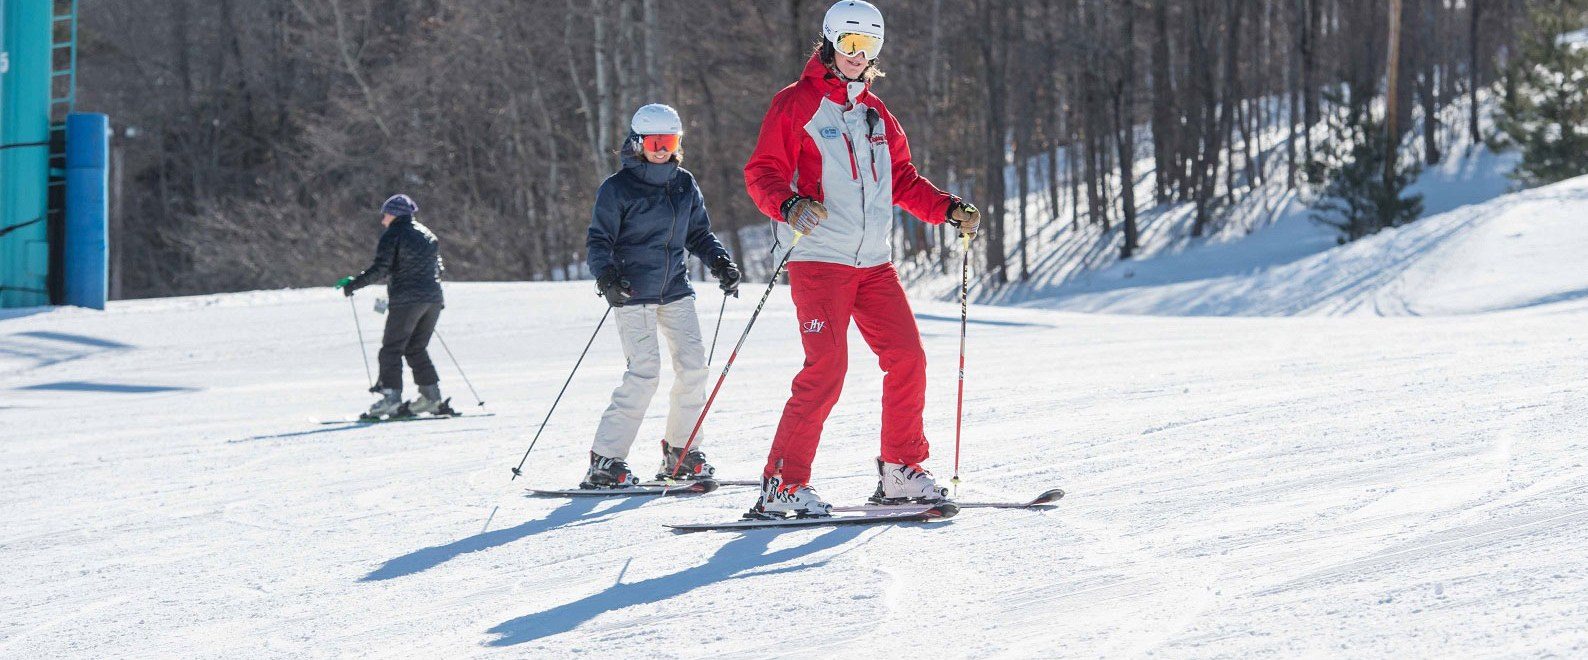 holiday valley ski resort: new york ski areas vacation get away